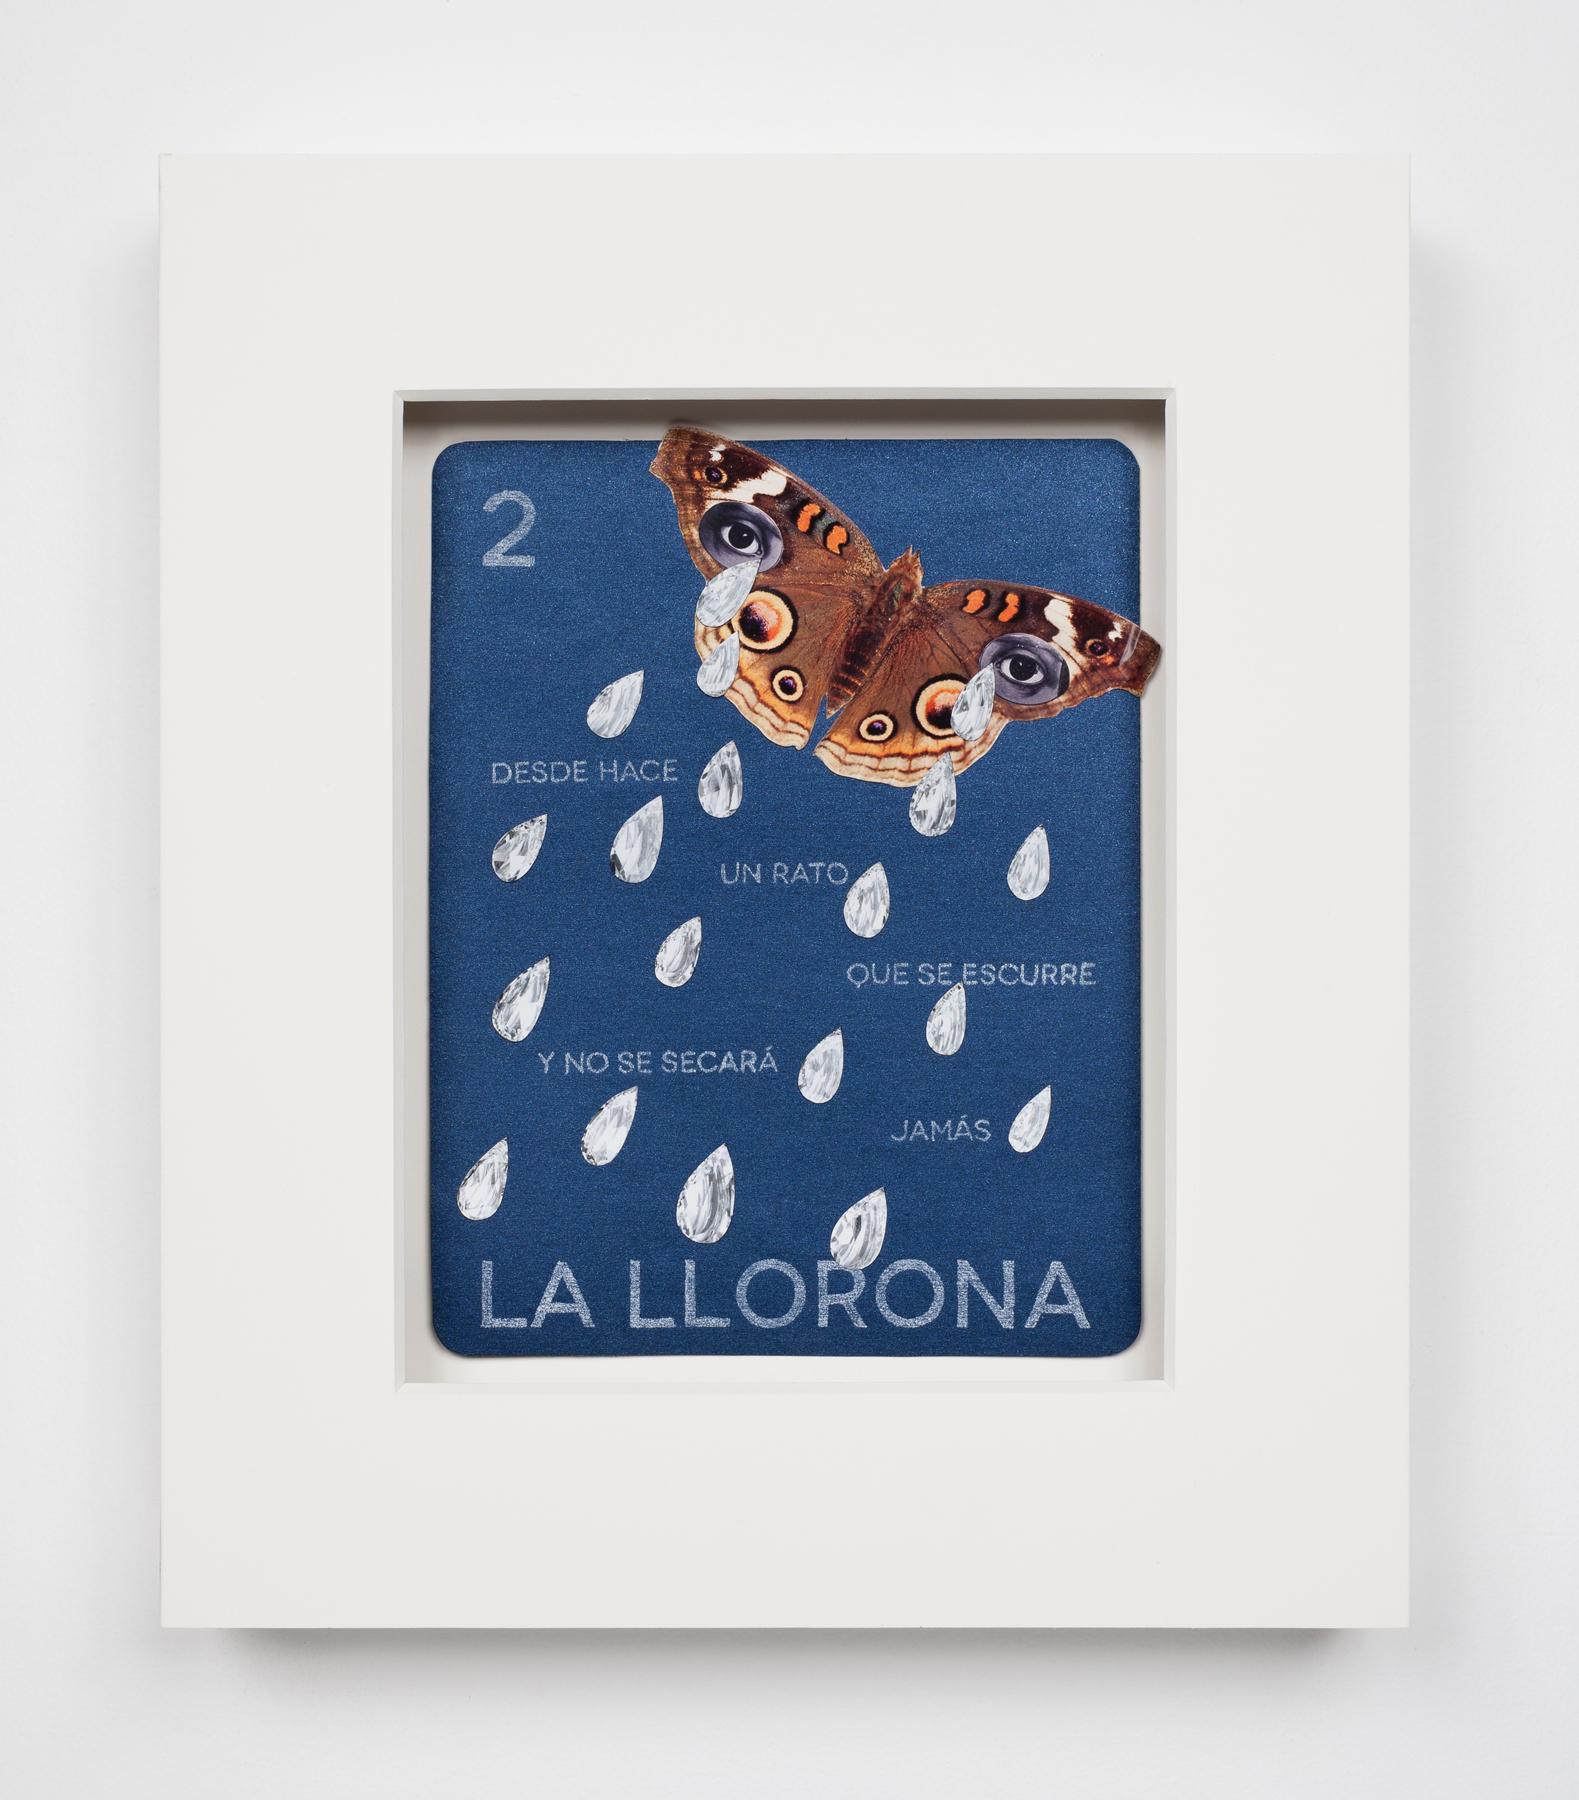 2 La Llorona (The Crying One)